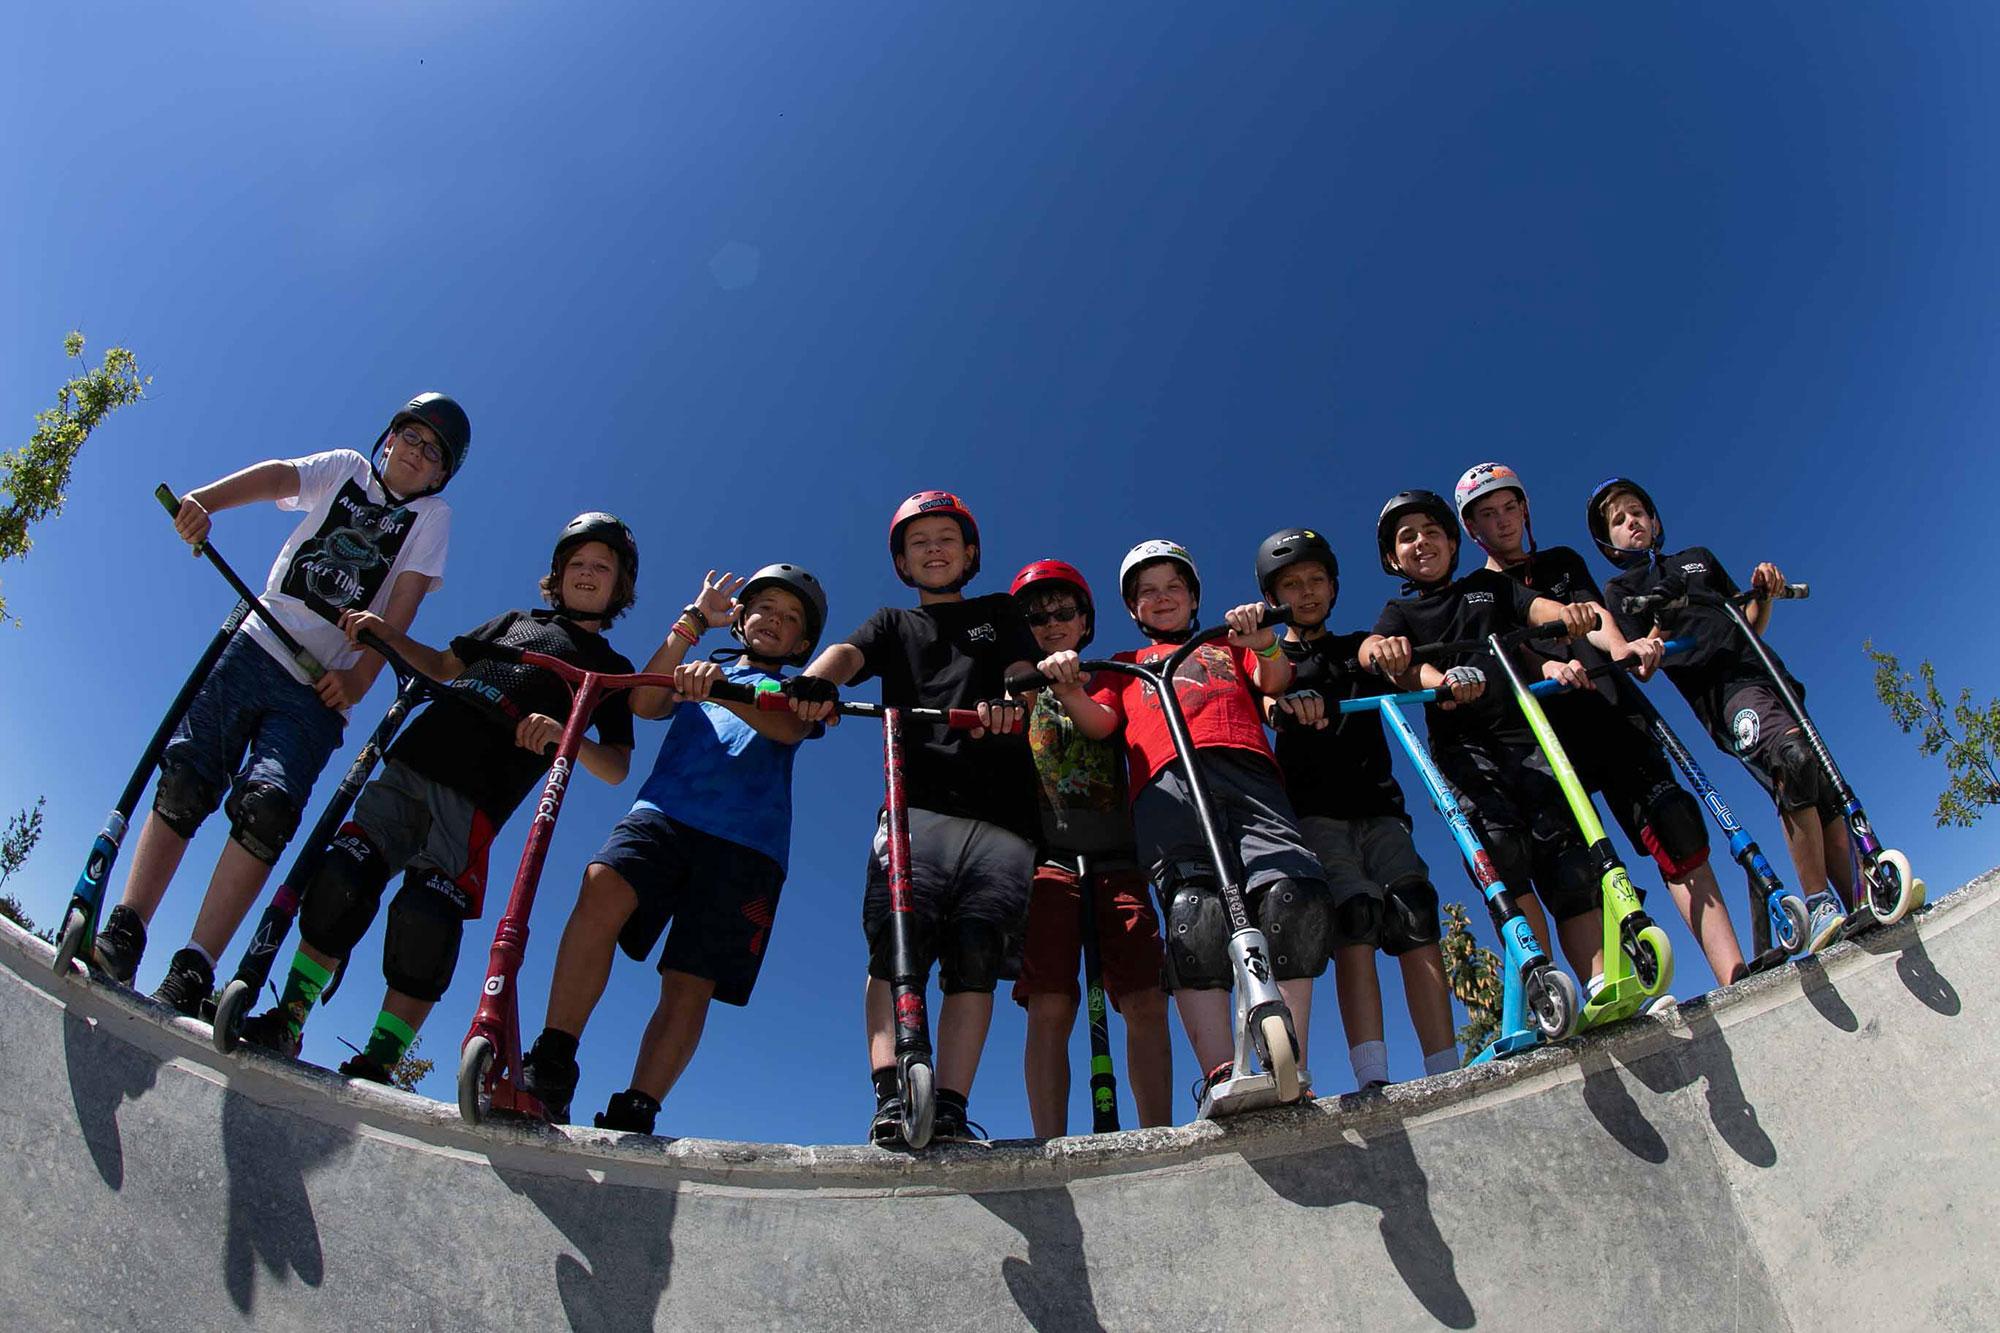 Skateboard & Scooter Summer Camp 2021 – York Region